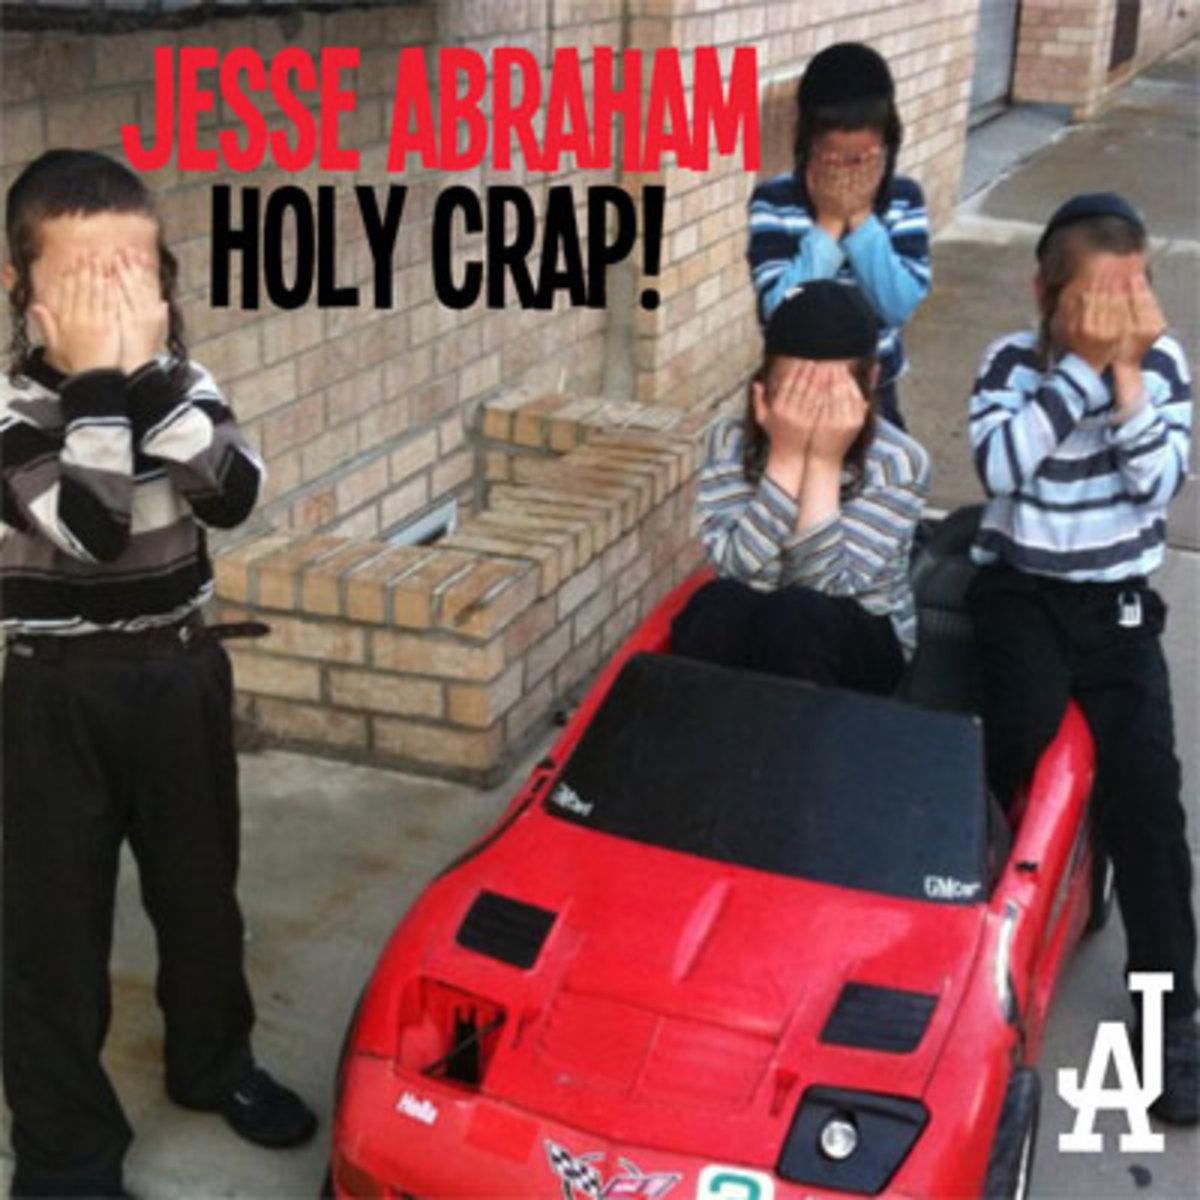 jesseabraham-holycrap.jpg